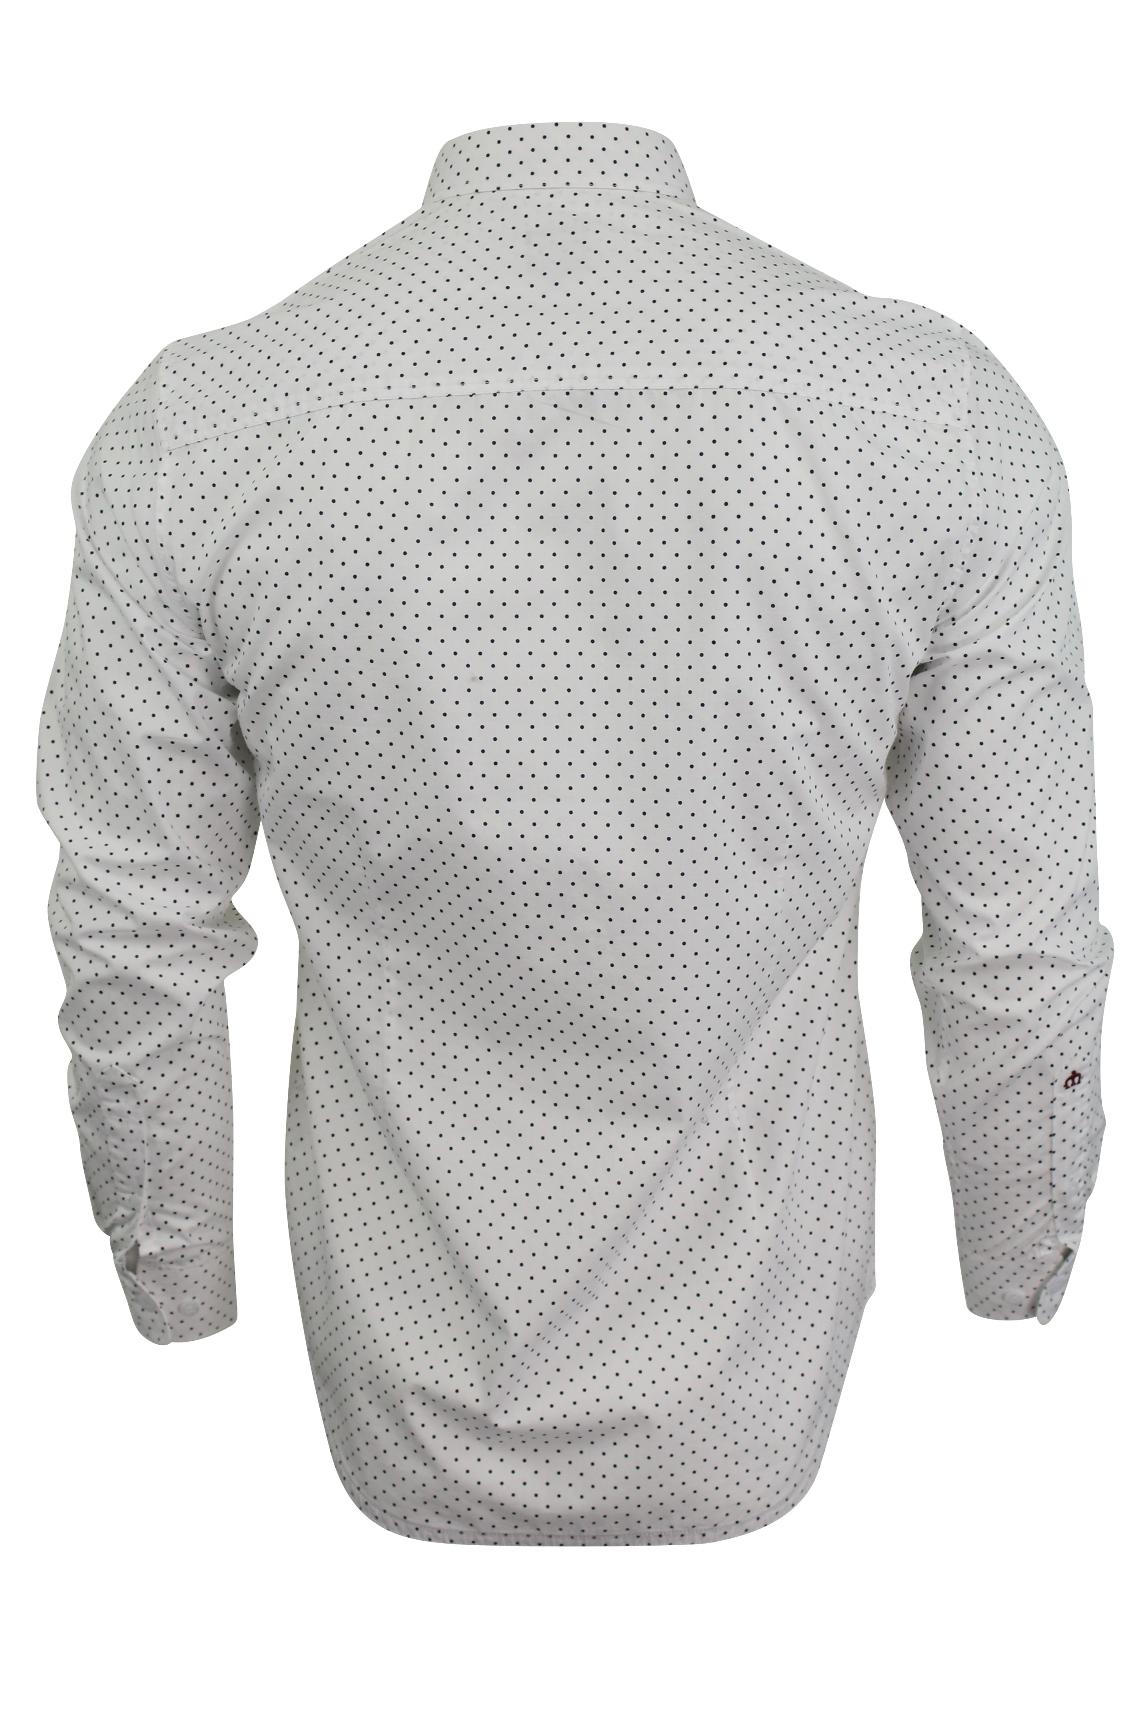 Mens-Polka-Dot-Shirt-by-Merc-London-039-Siegel-039-Long-Sleeved thumbnail 8